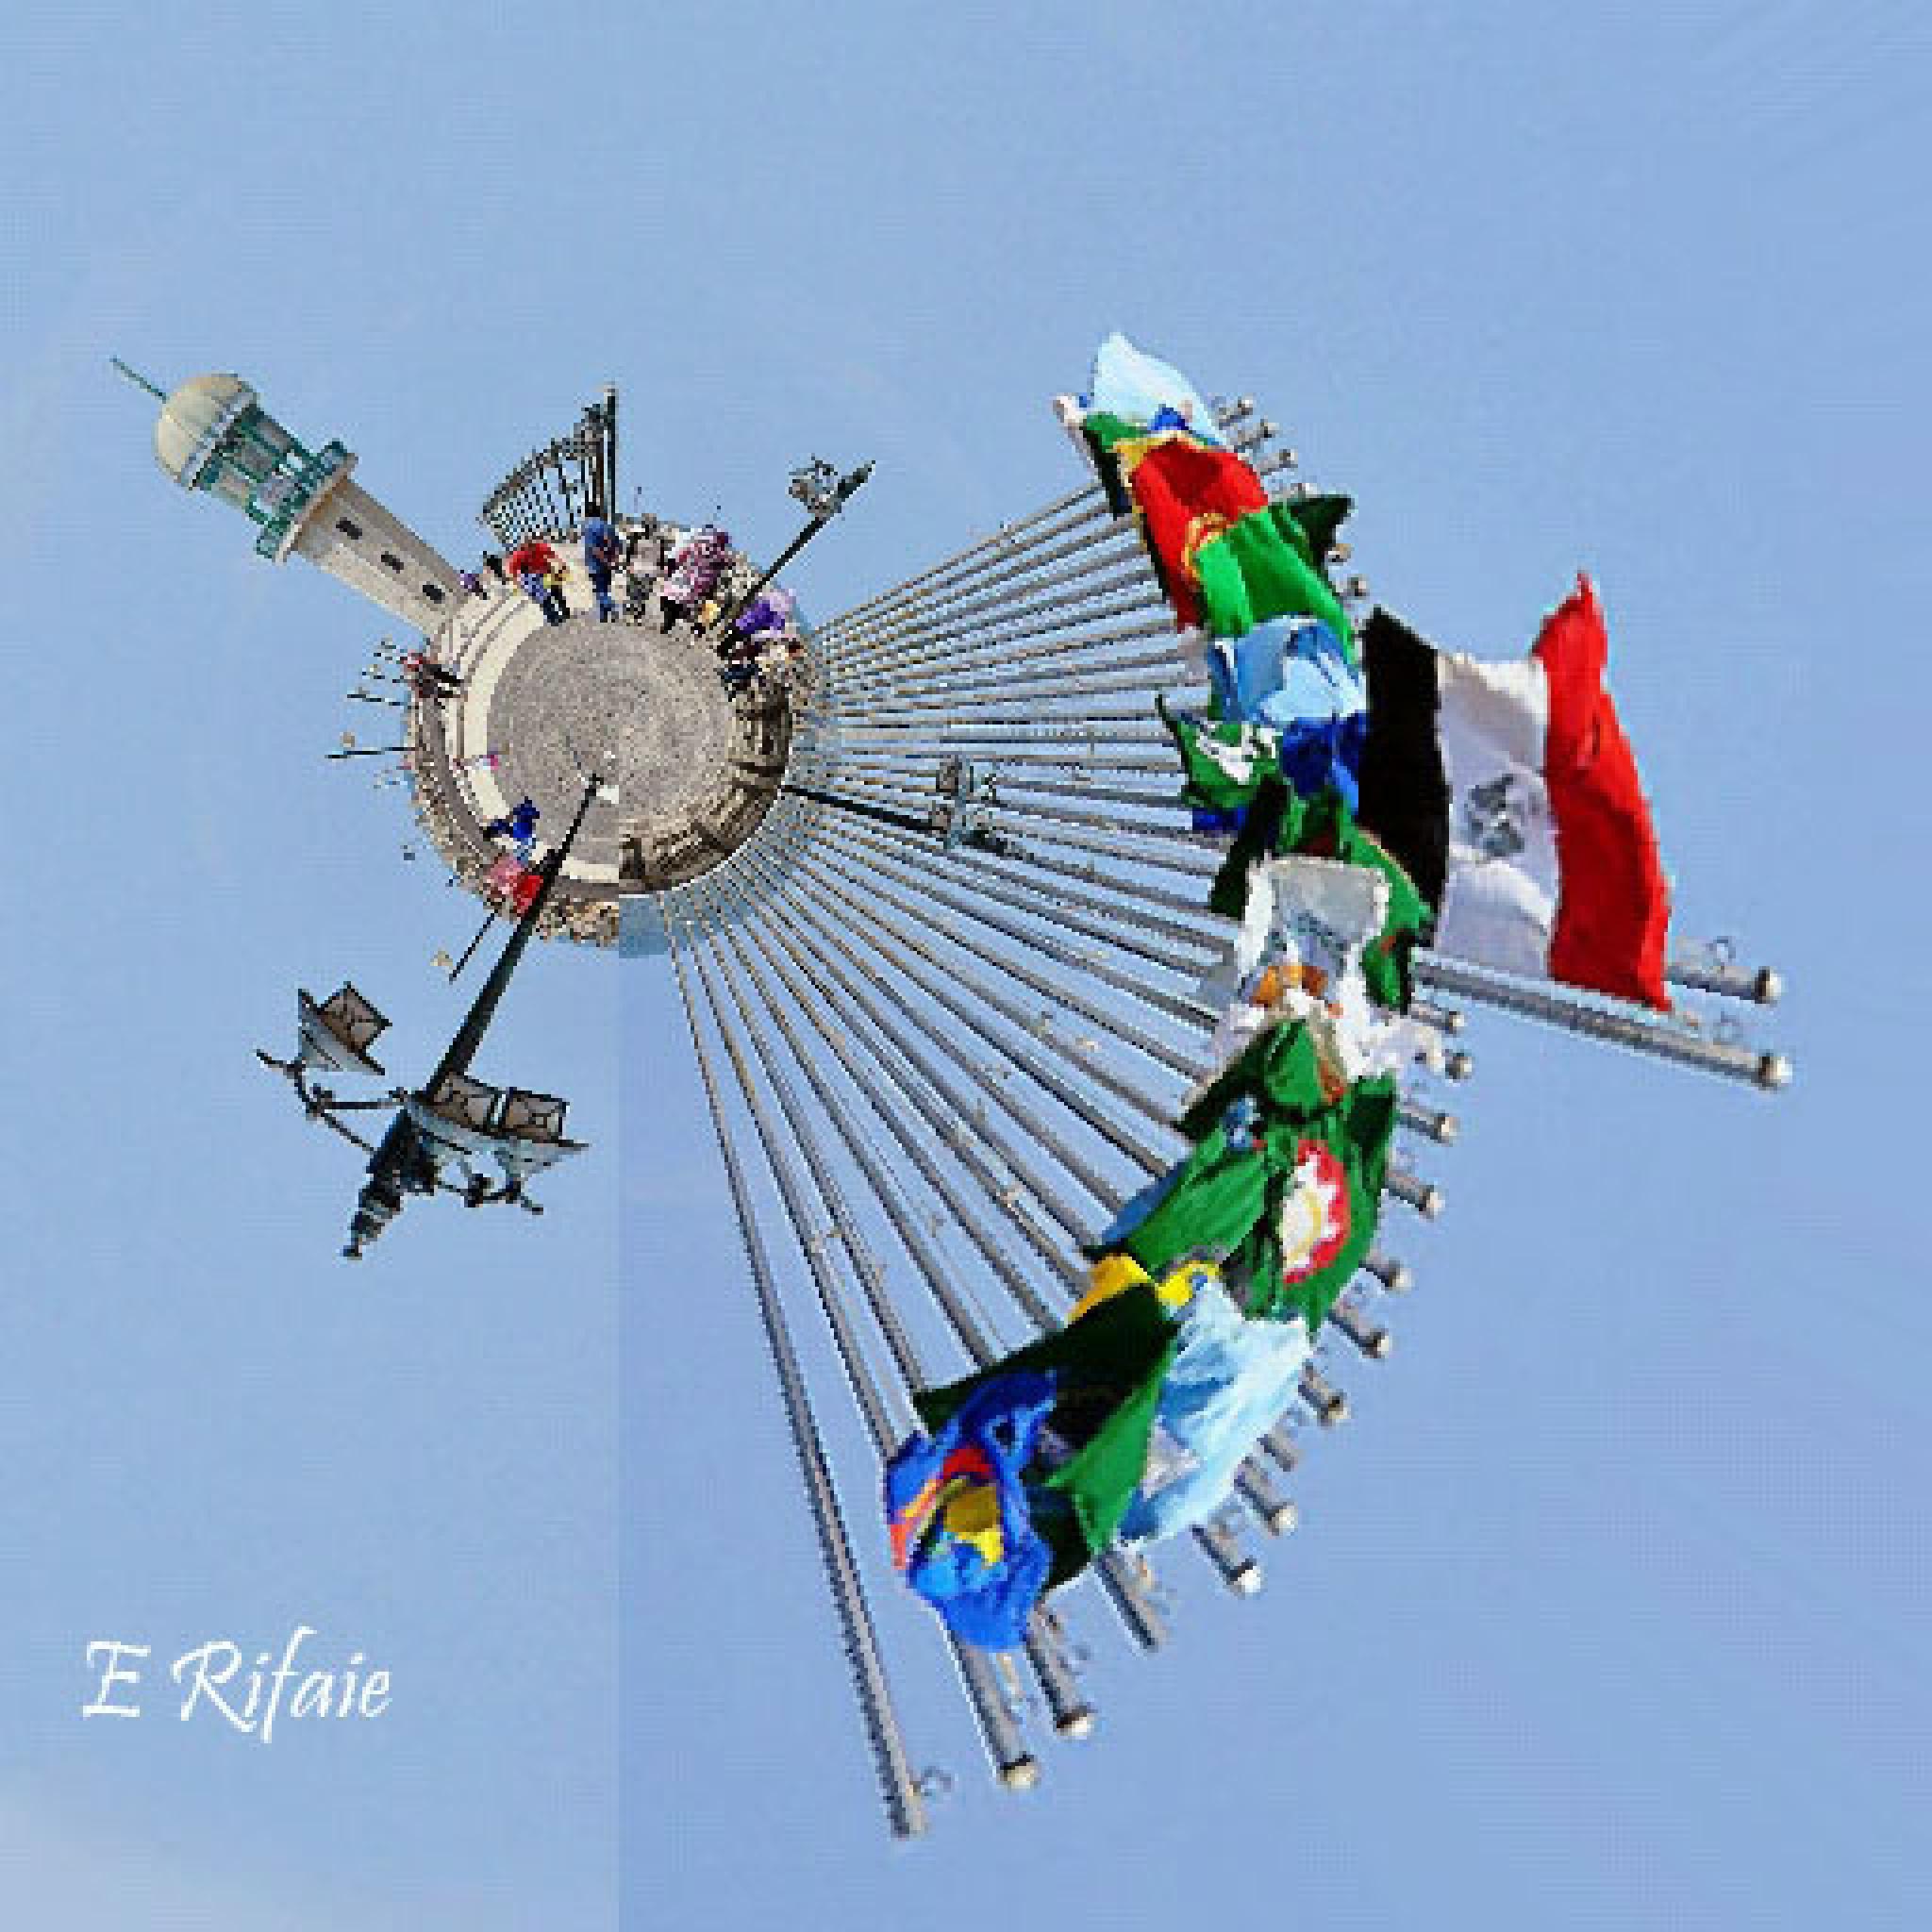 Ras Elbar Egypt by Emad Eldin Moustafa El Refaie